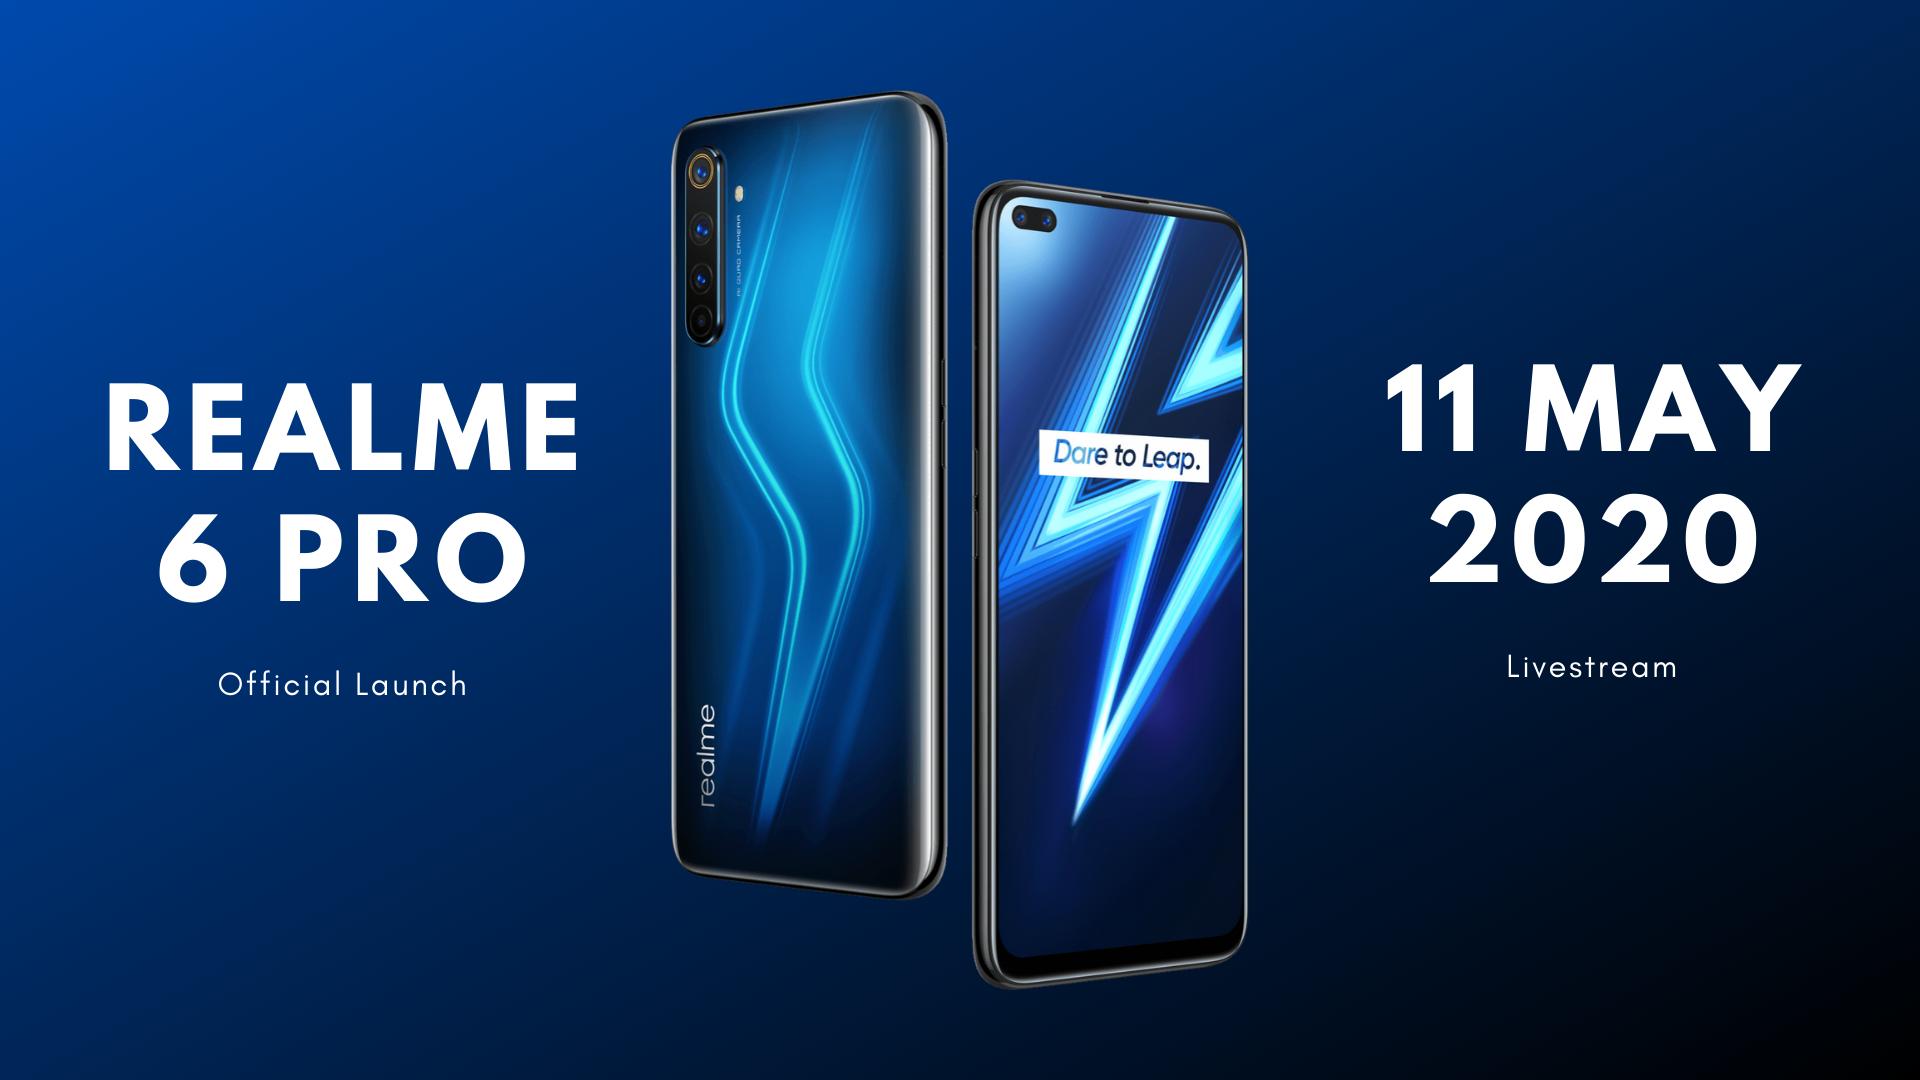 realme 6 pro official launch